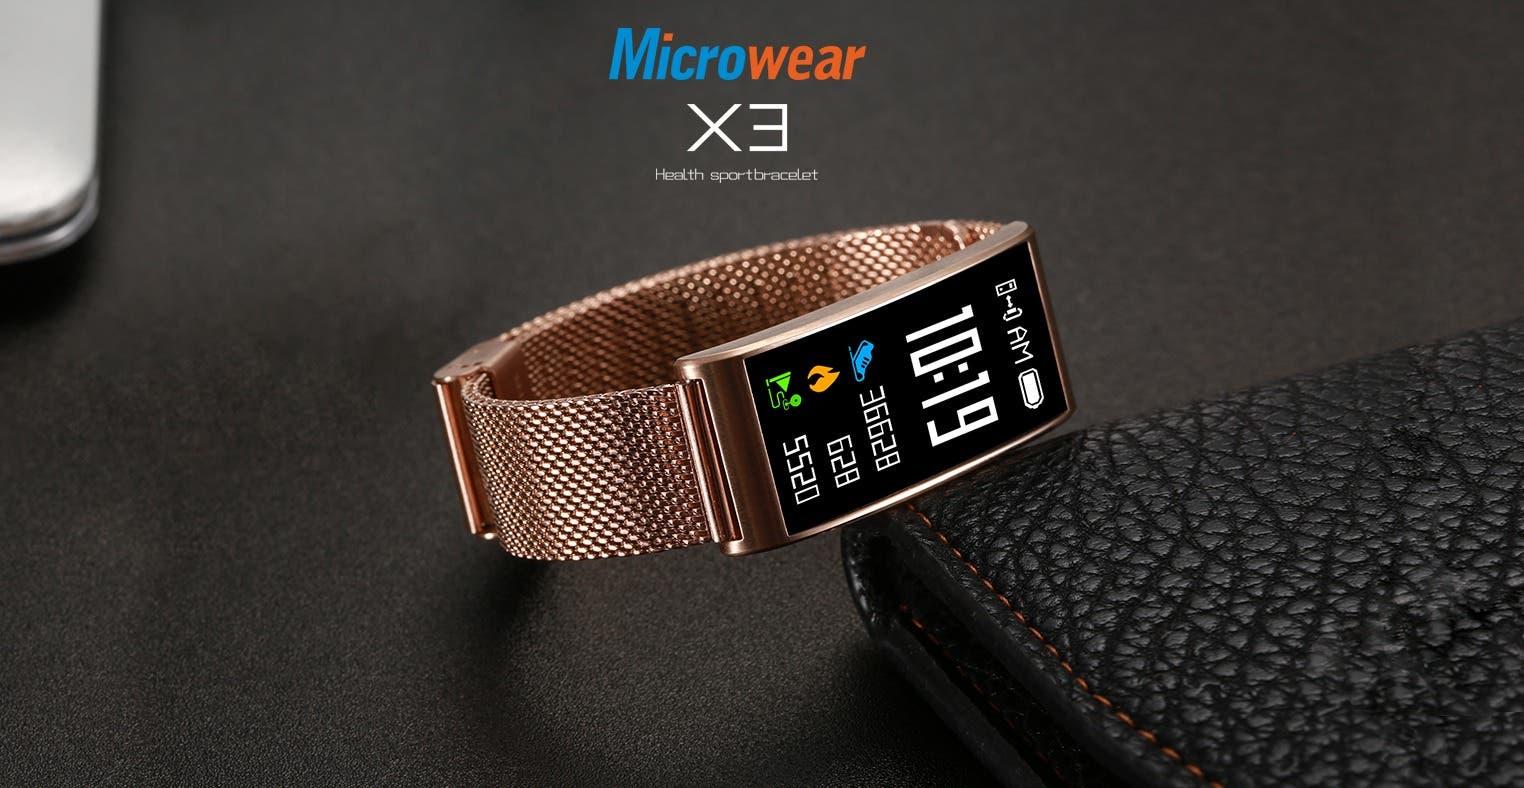 Microwear X3